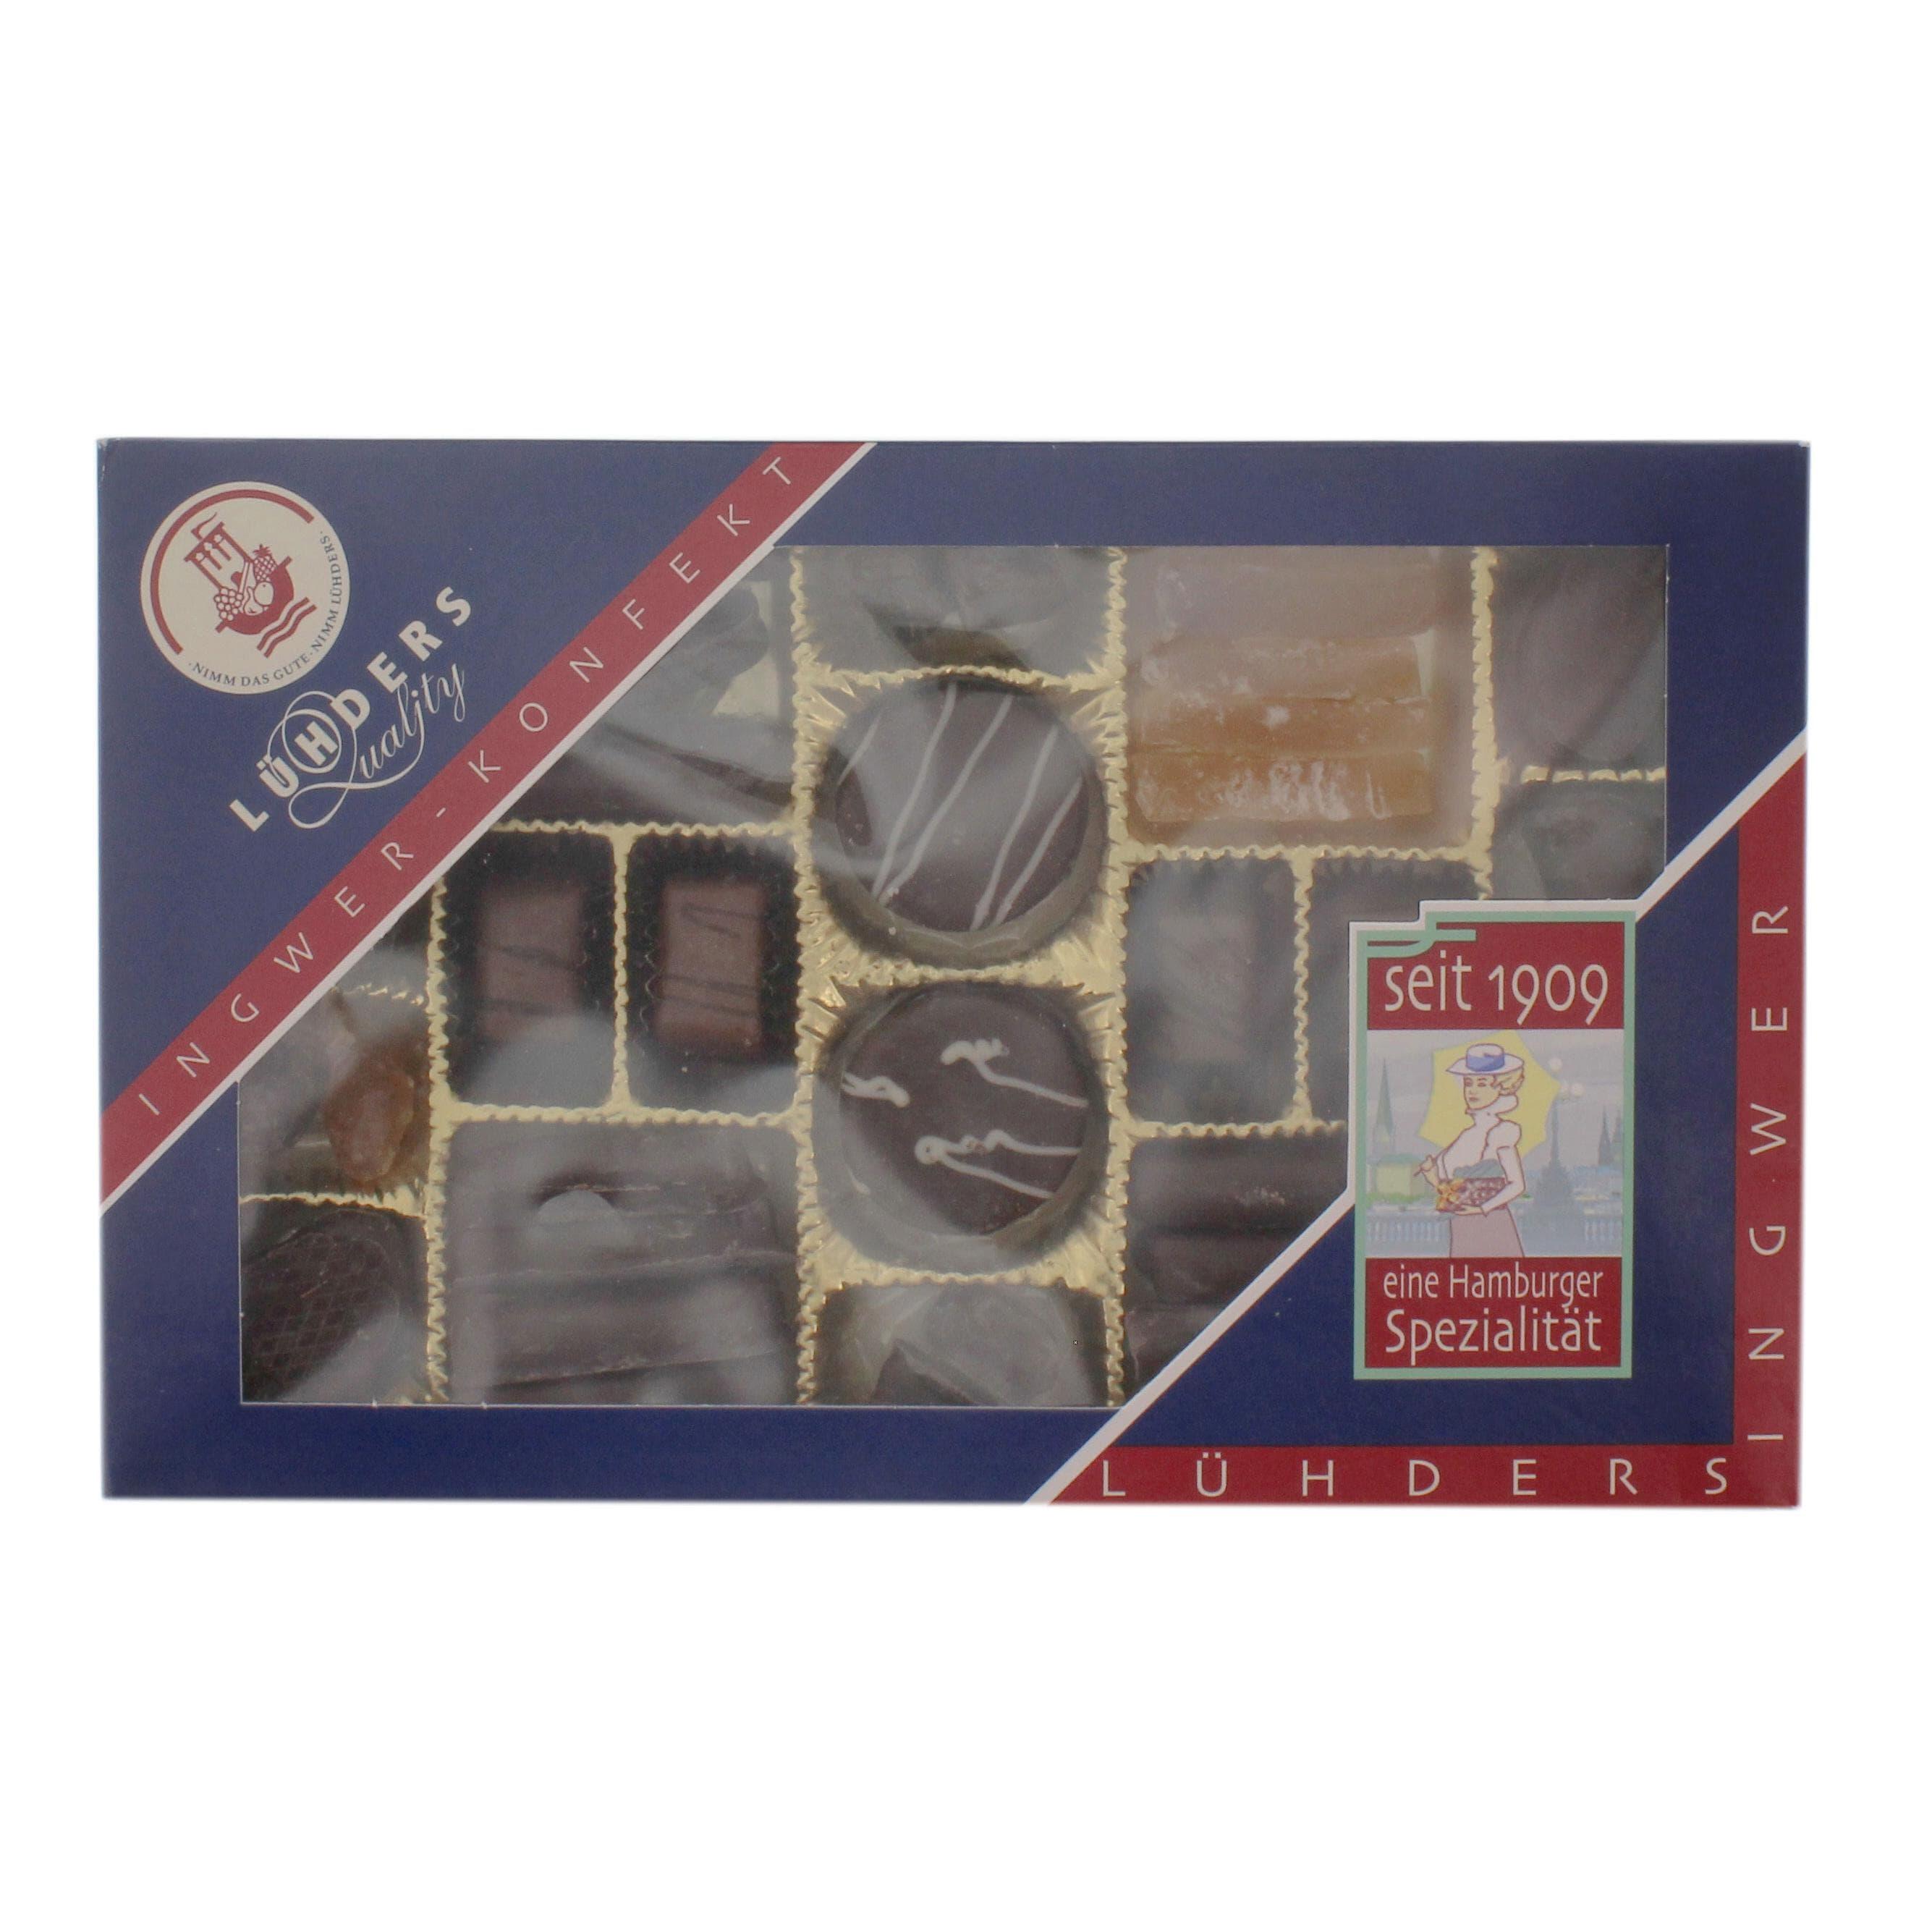 Lühders - Ingwer Konfekt - Schokolade - 250g